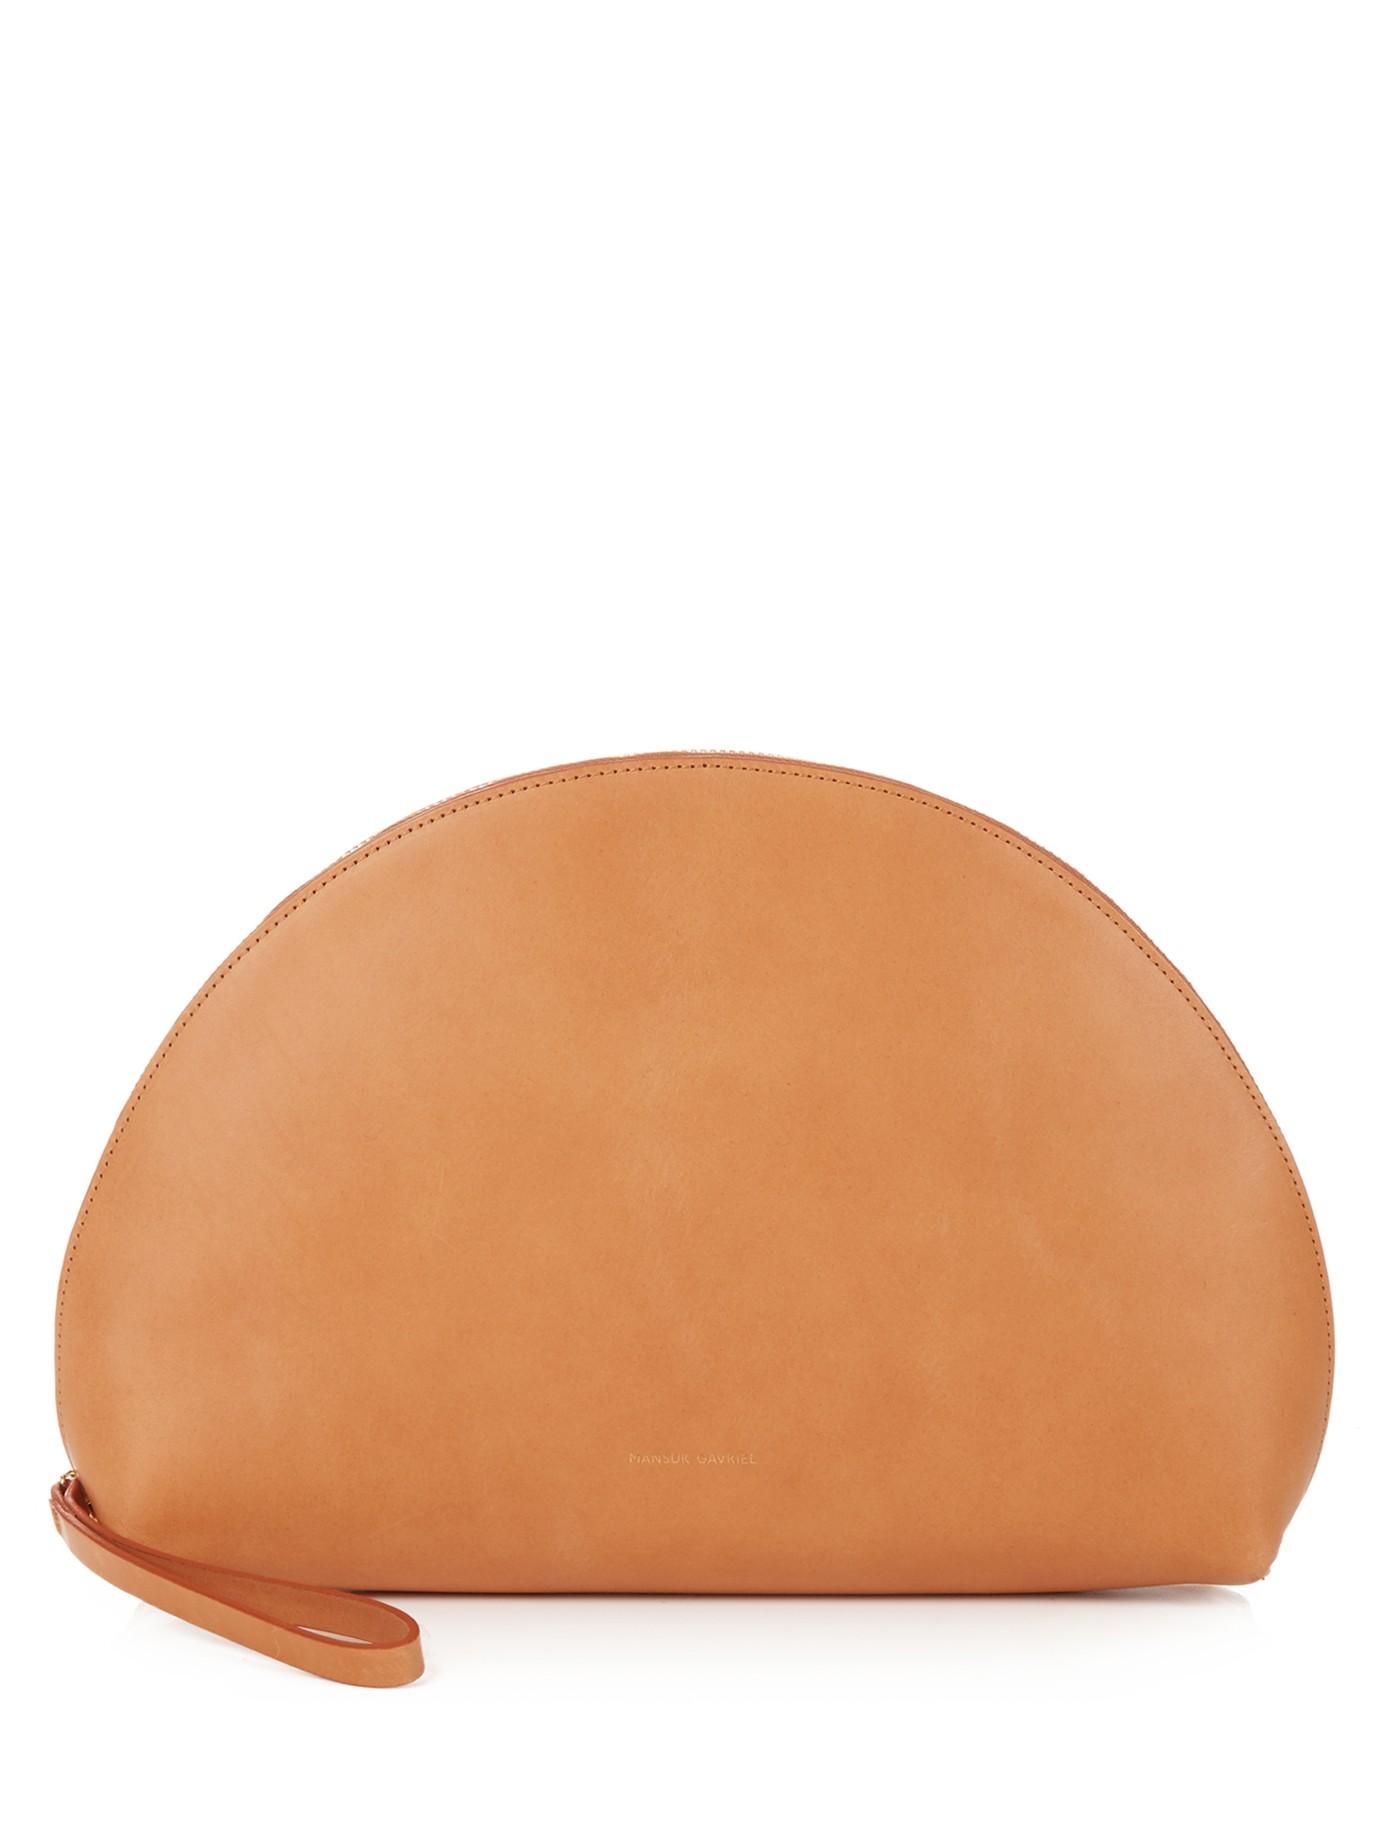 Mansur Gavriel 'Moon Leather Clutch'